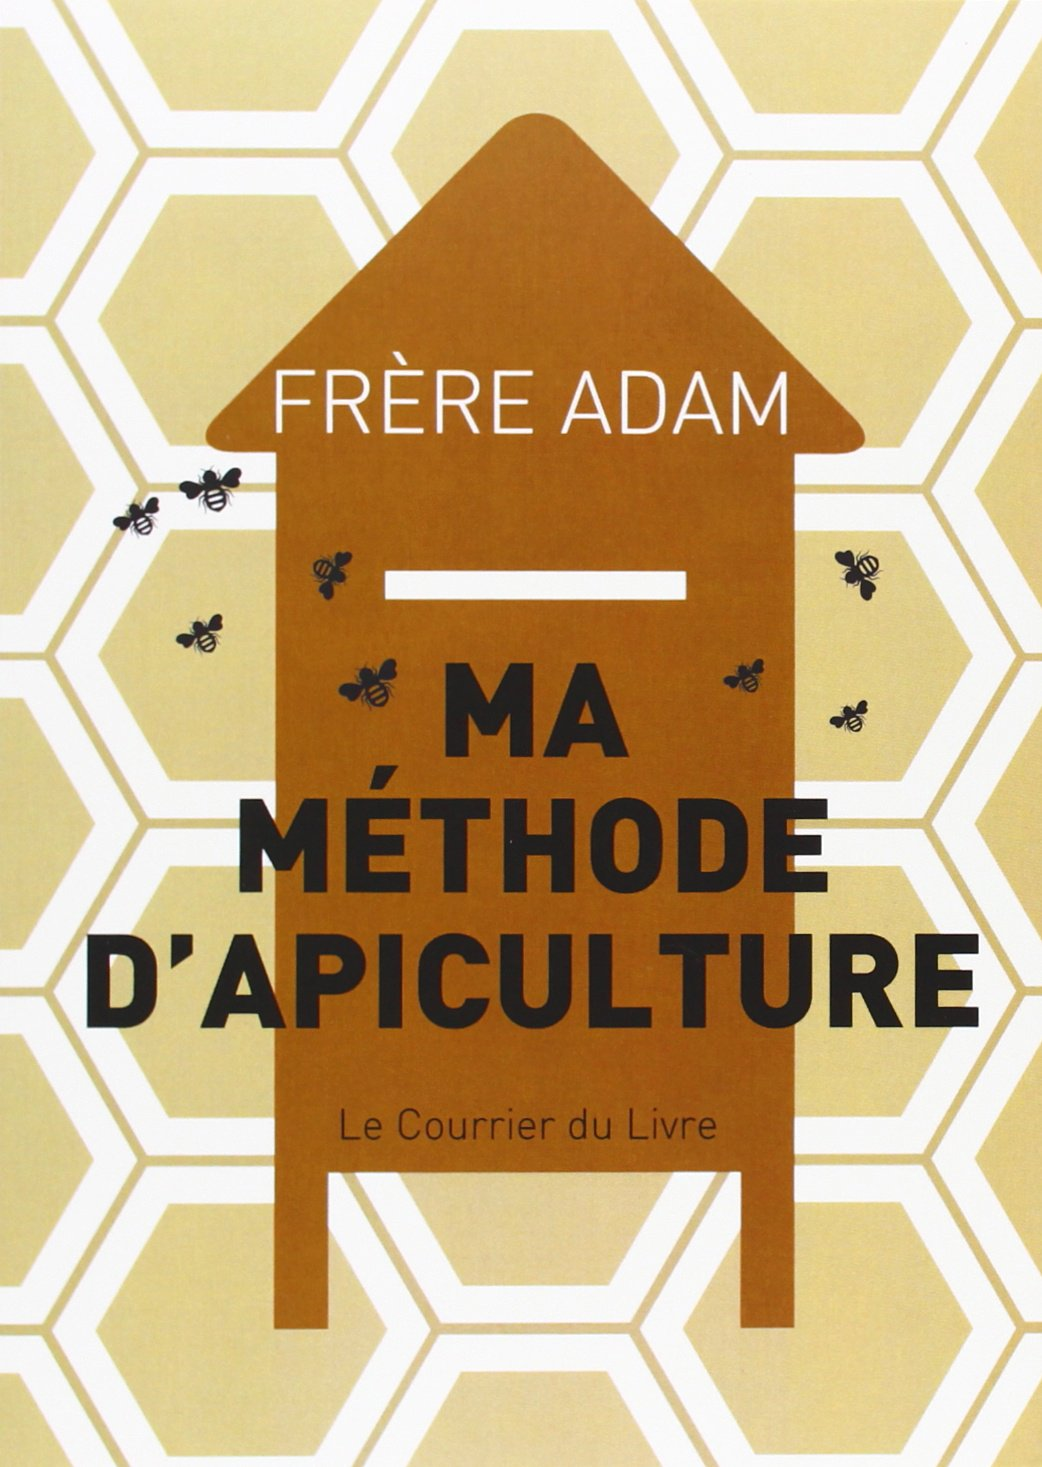 Ma méthode d'apiculture Broché – 5 juillet 2010 Frère Adam Ma méthode d'apiculture Le Courrier du Livre 2702907989